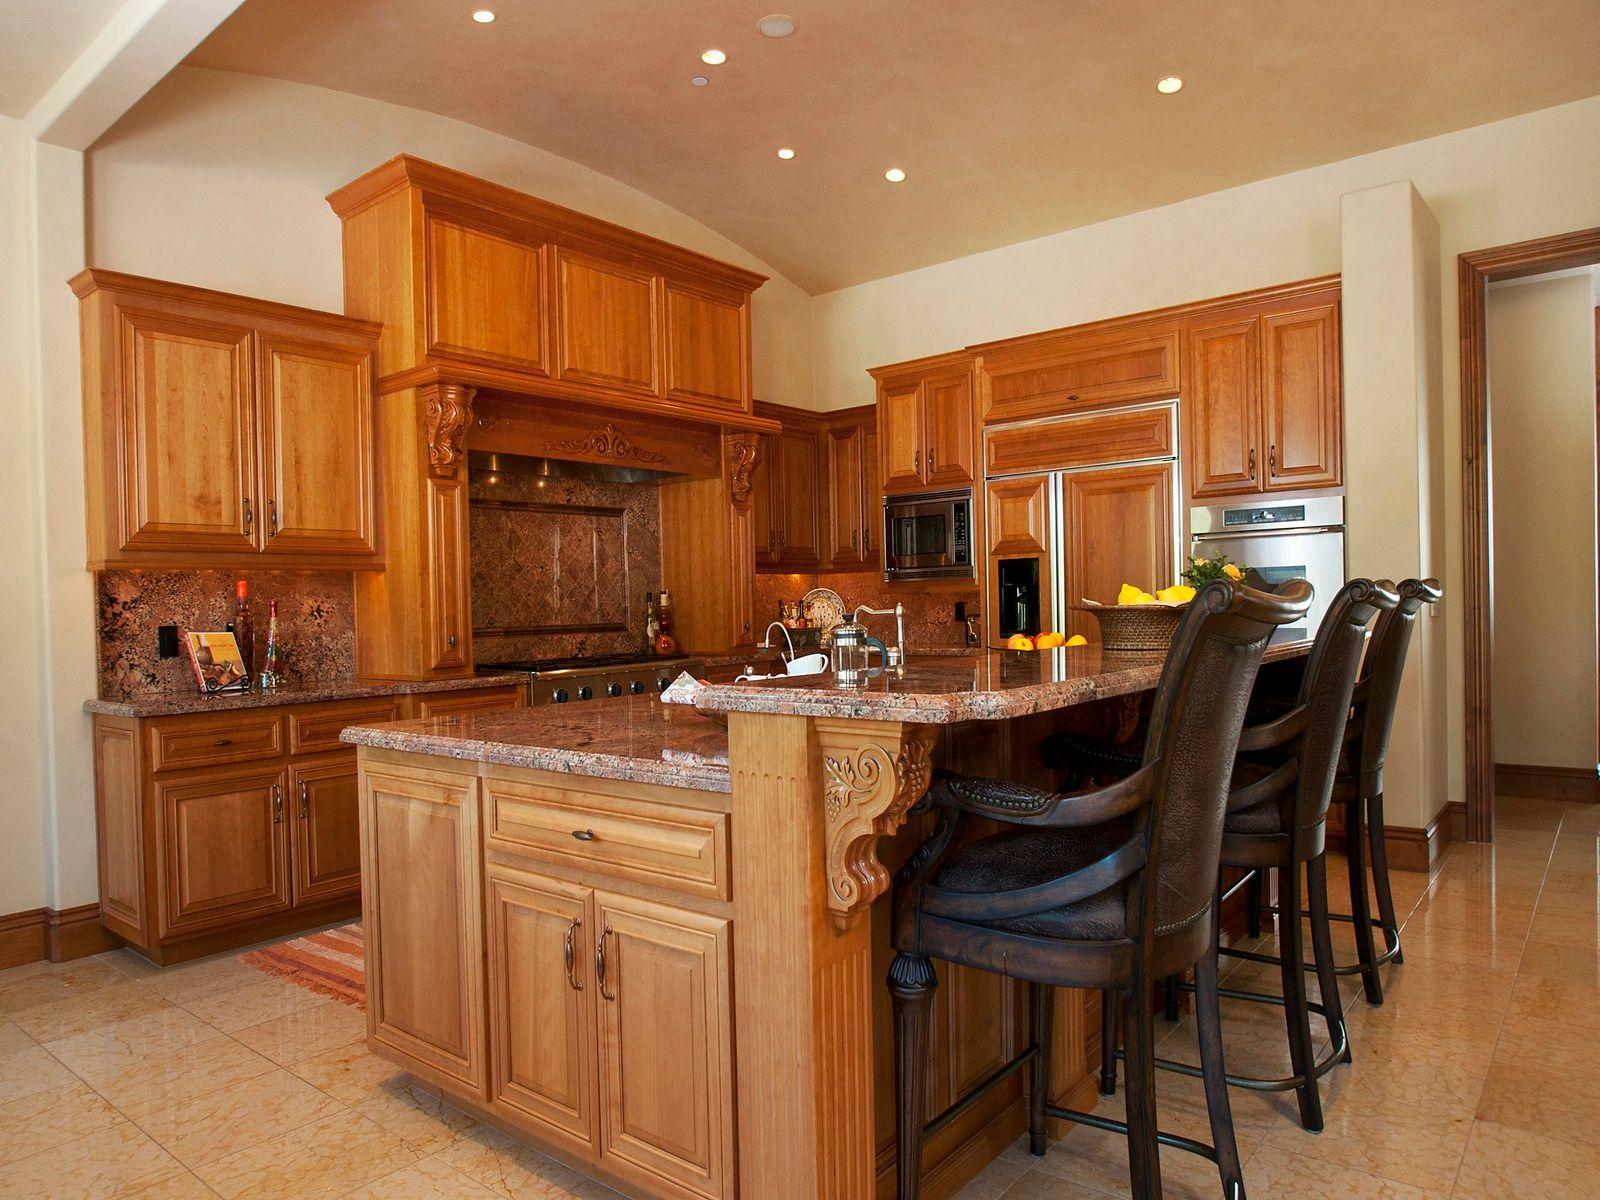 Gourmet kitchen with 7 x 10' island